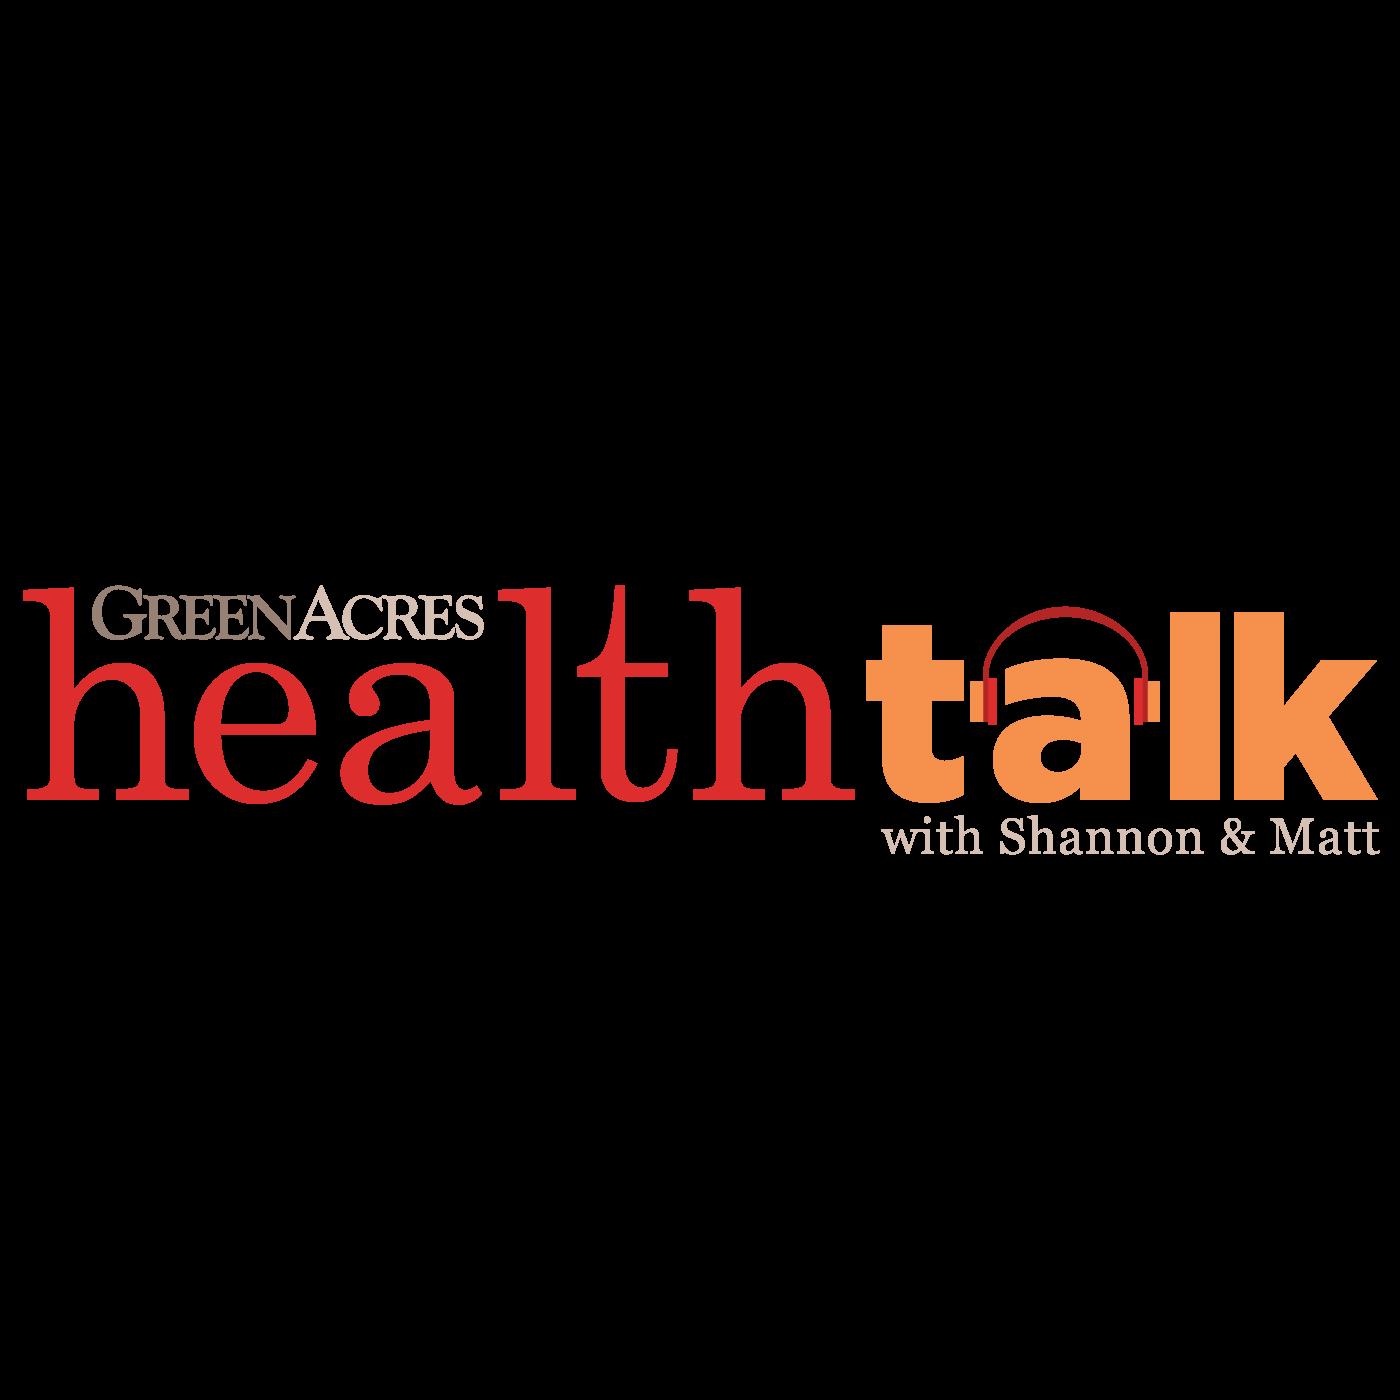 GreenAcres HealthTalk